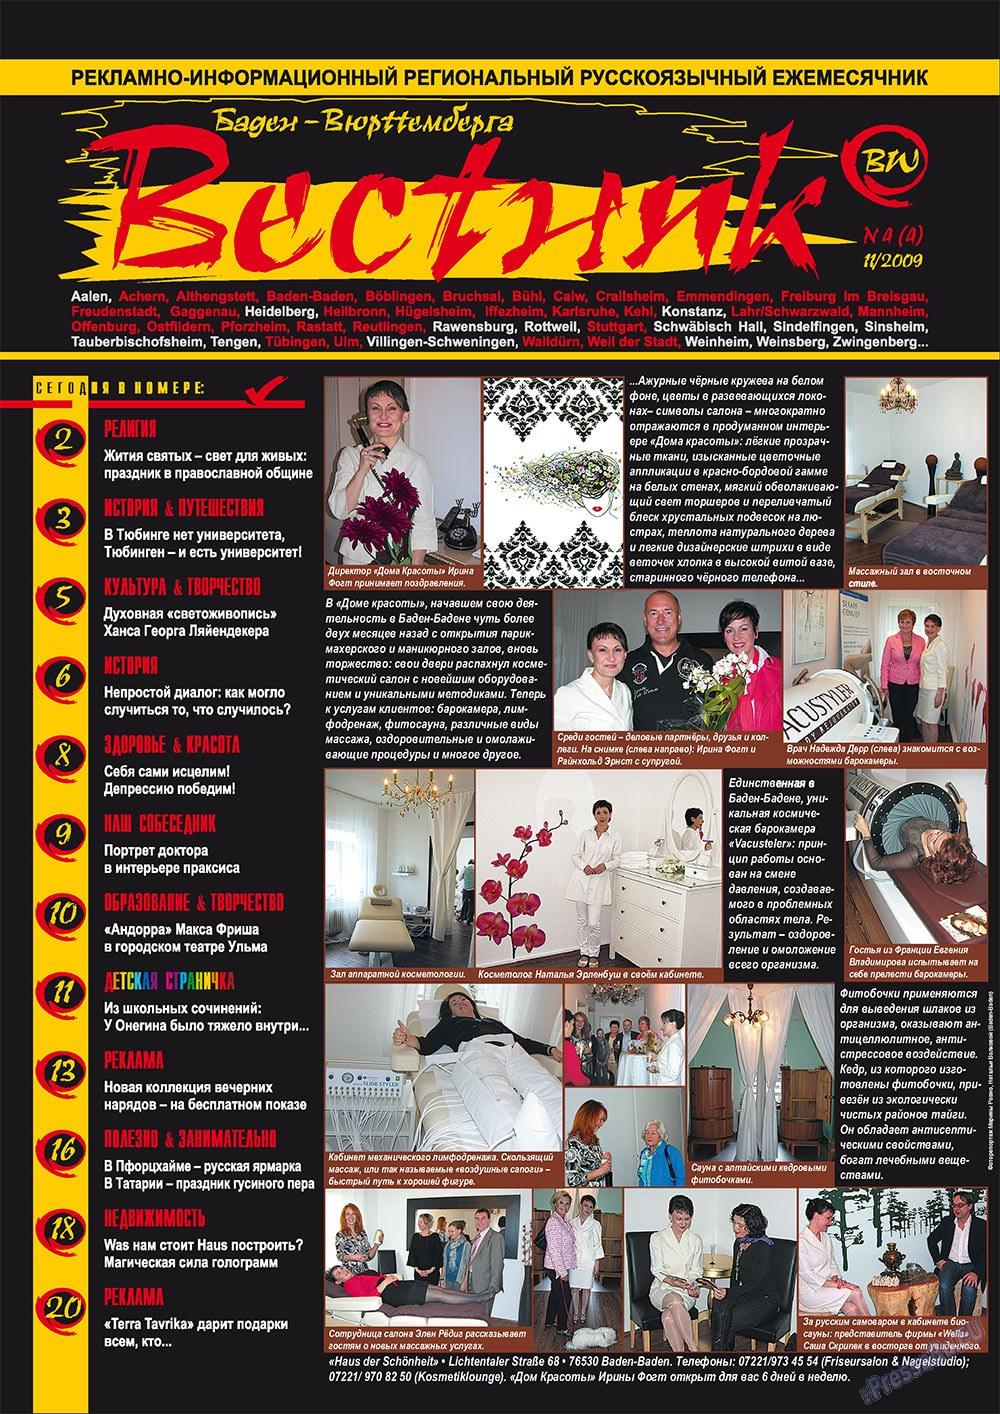 Вестник-info (журнал). 2009 год, номер 4, стр. 1